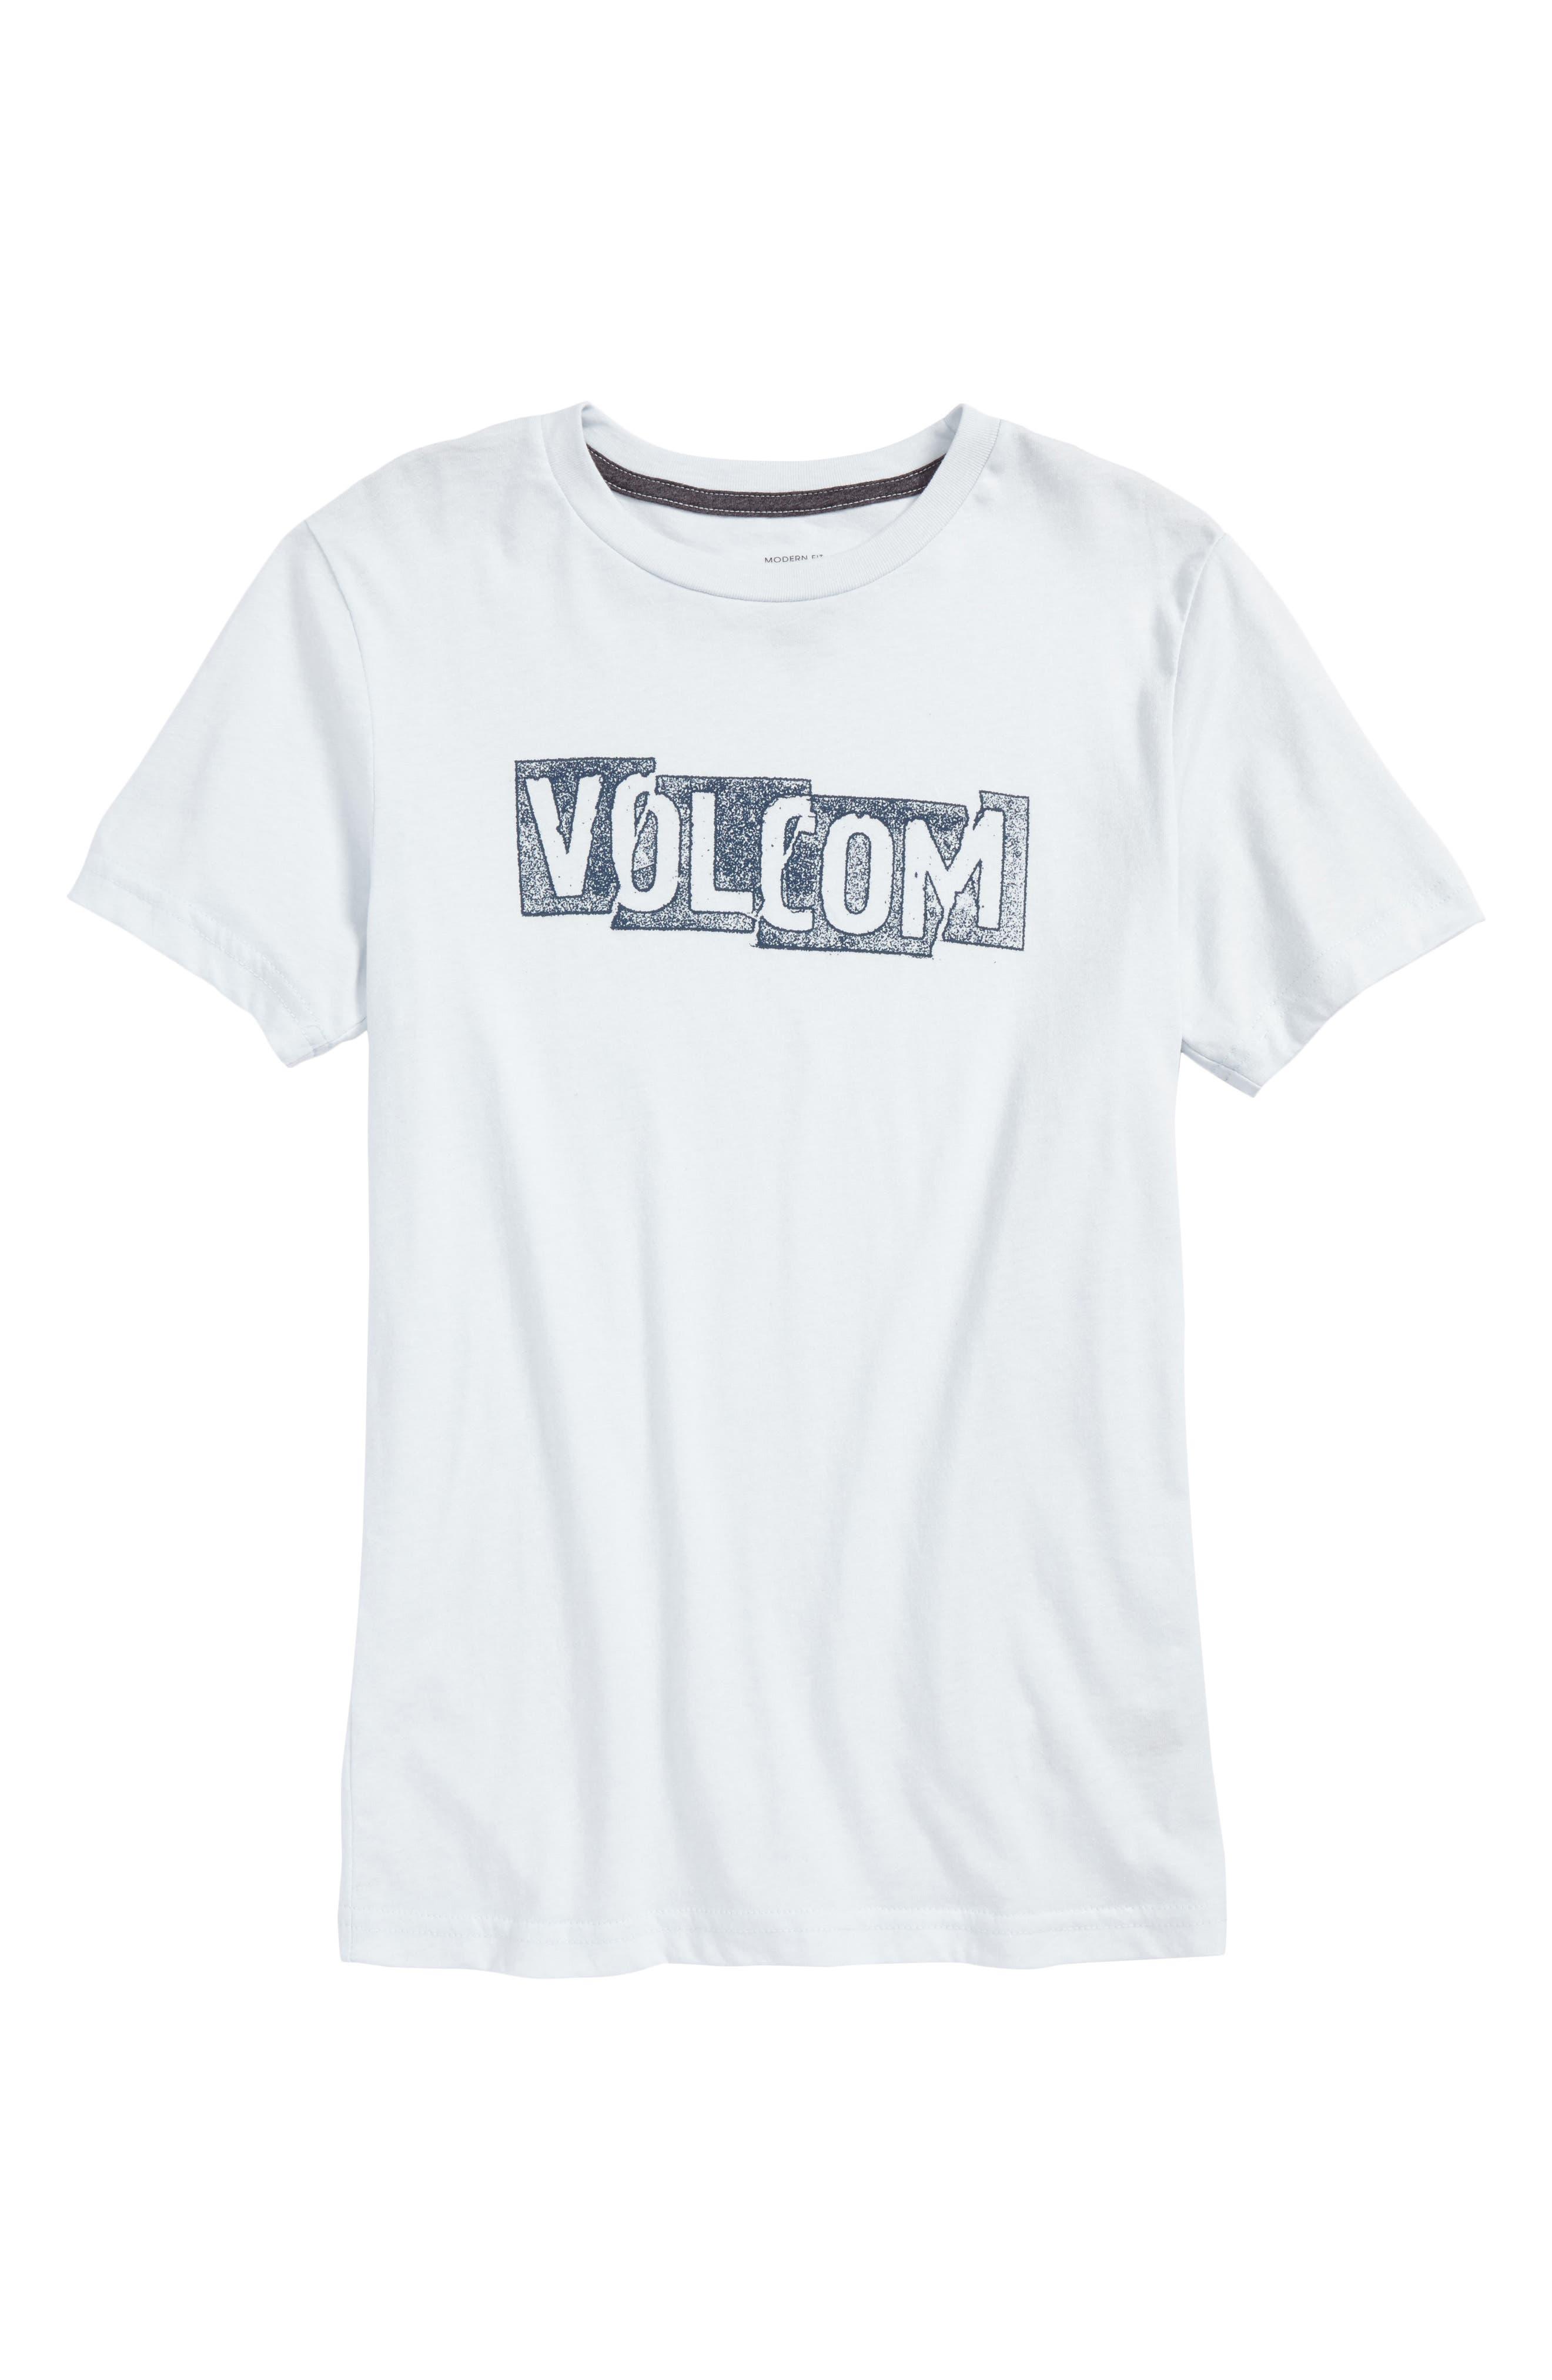 Main Image - Volcom Edge Logo Graphic T-Shirt (Big Boys)